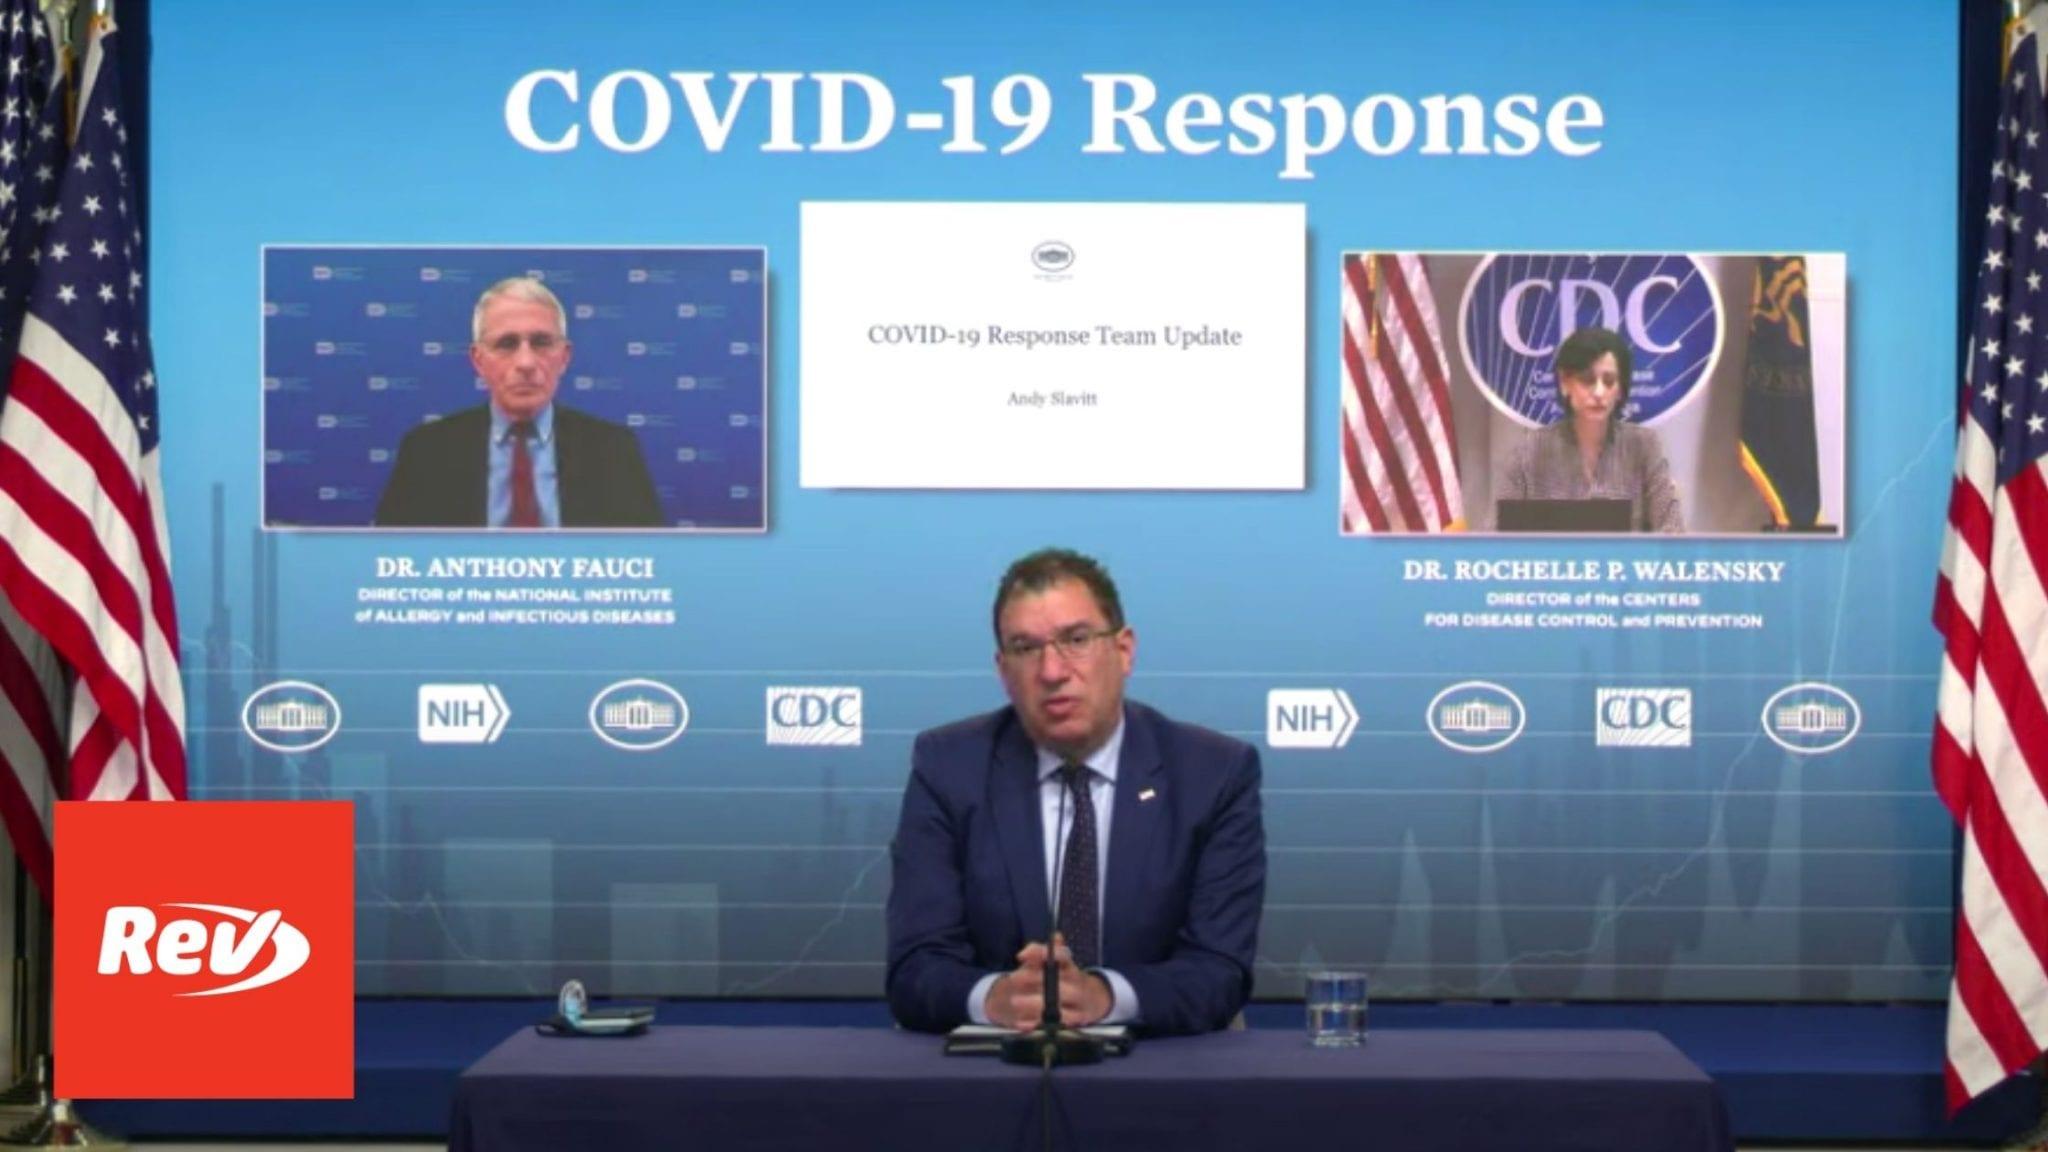 White House COVID-19 Task Force, Dr. Fauci Press Conference Transcript April 2